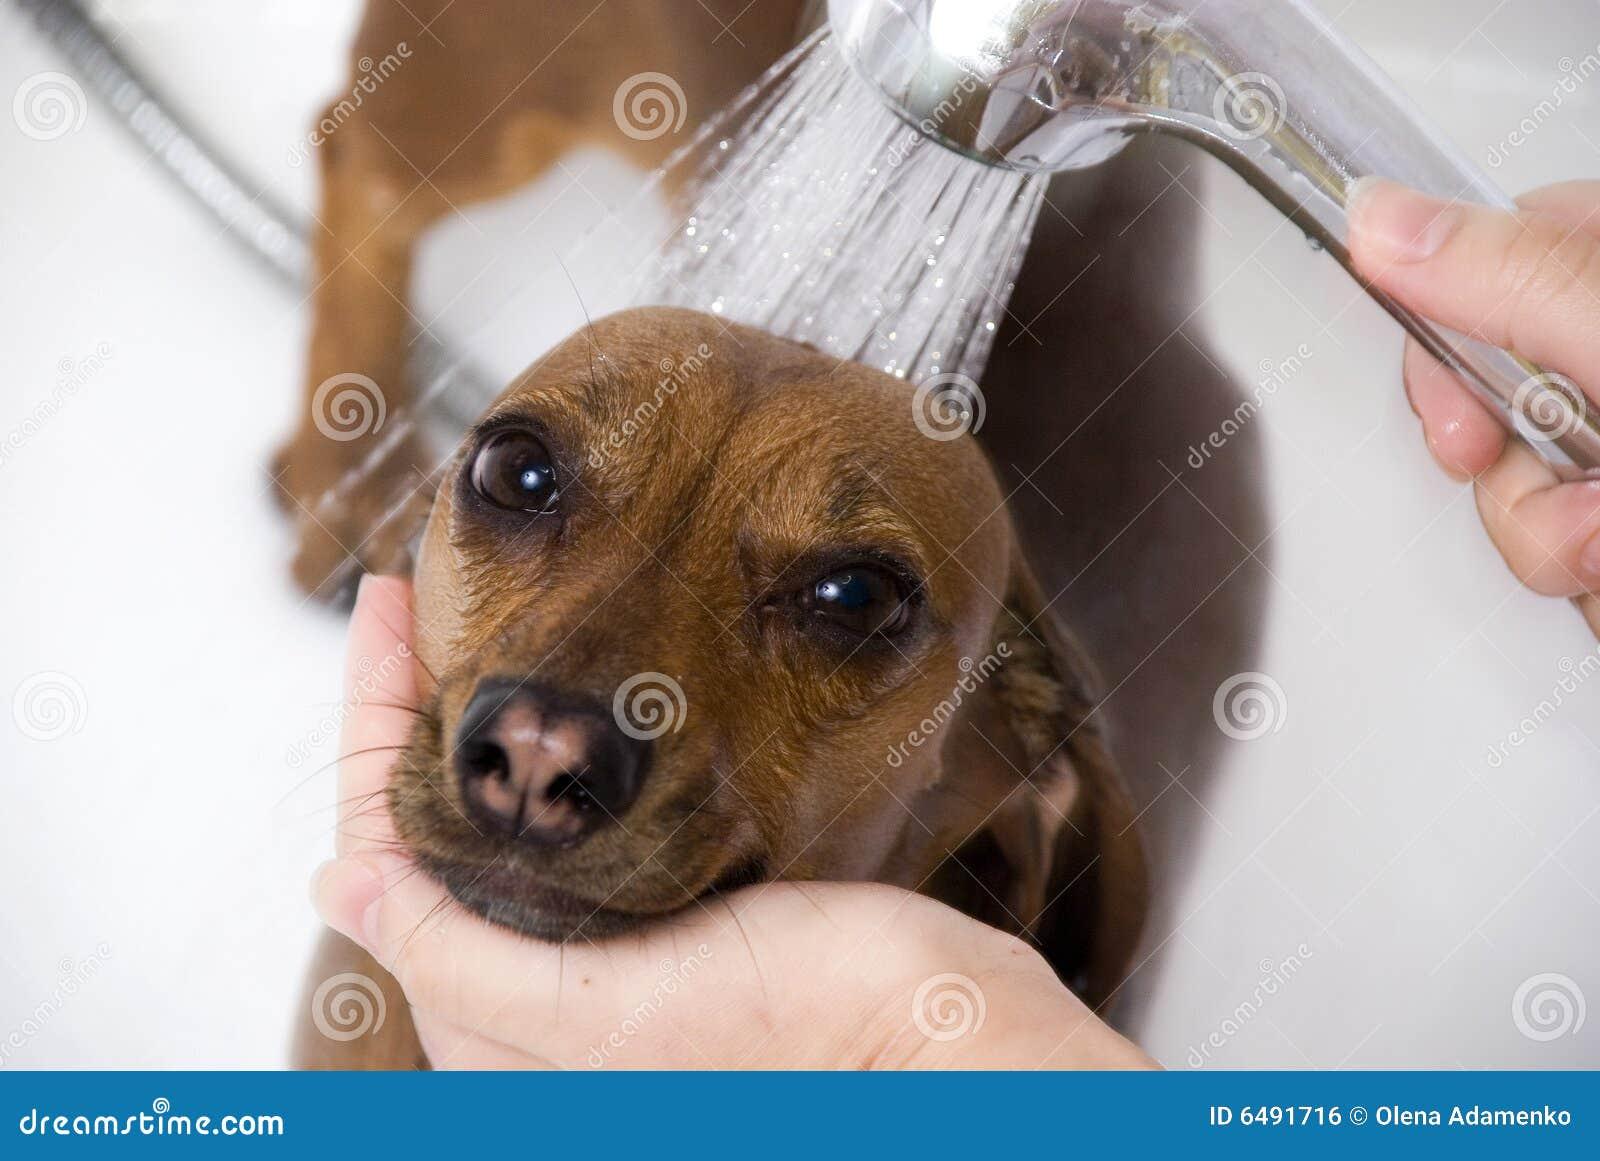 The dog have a bath